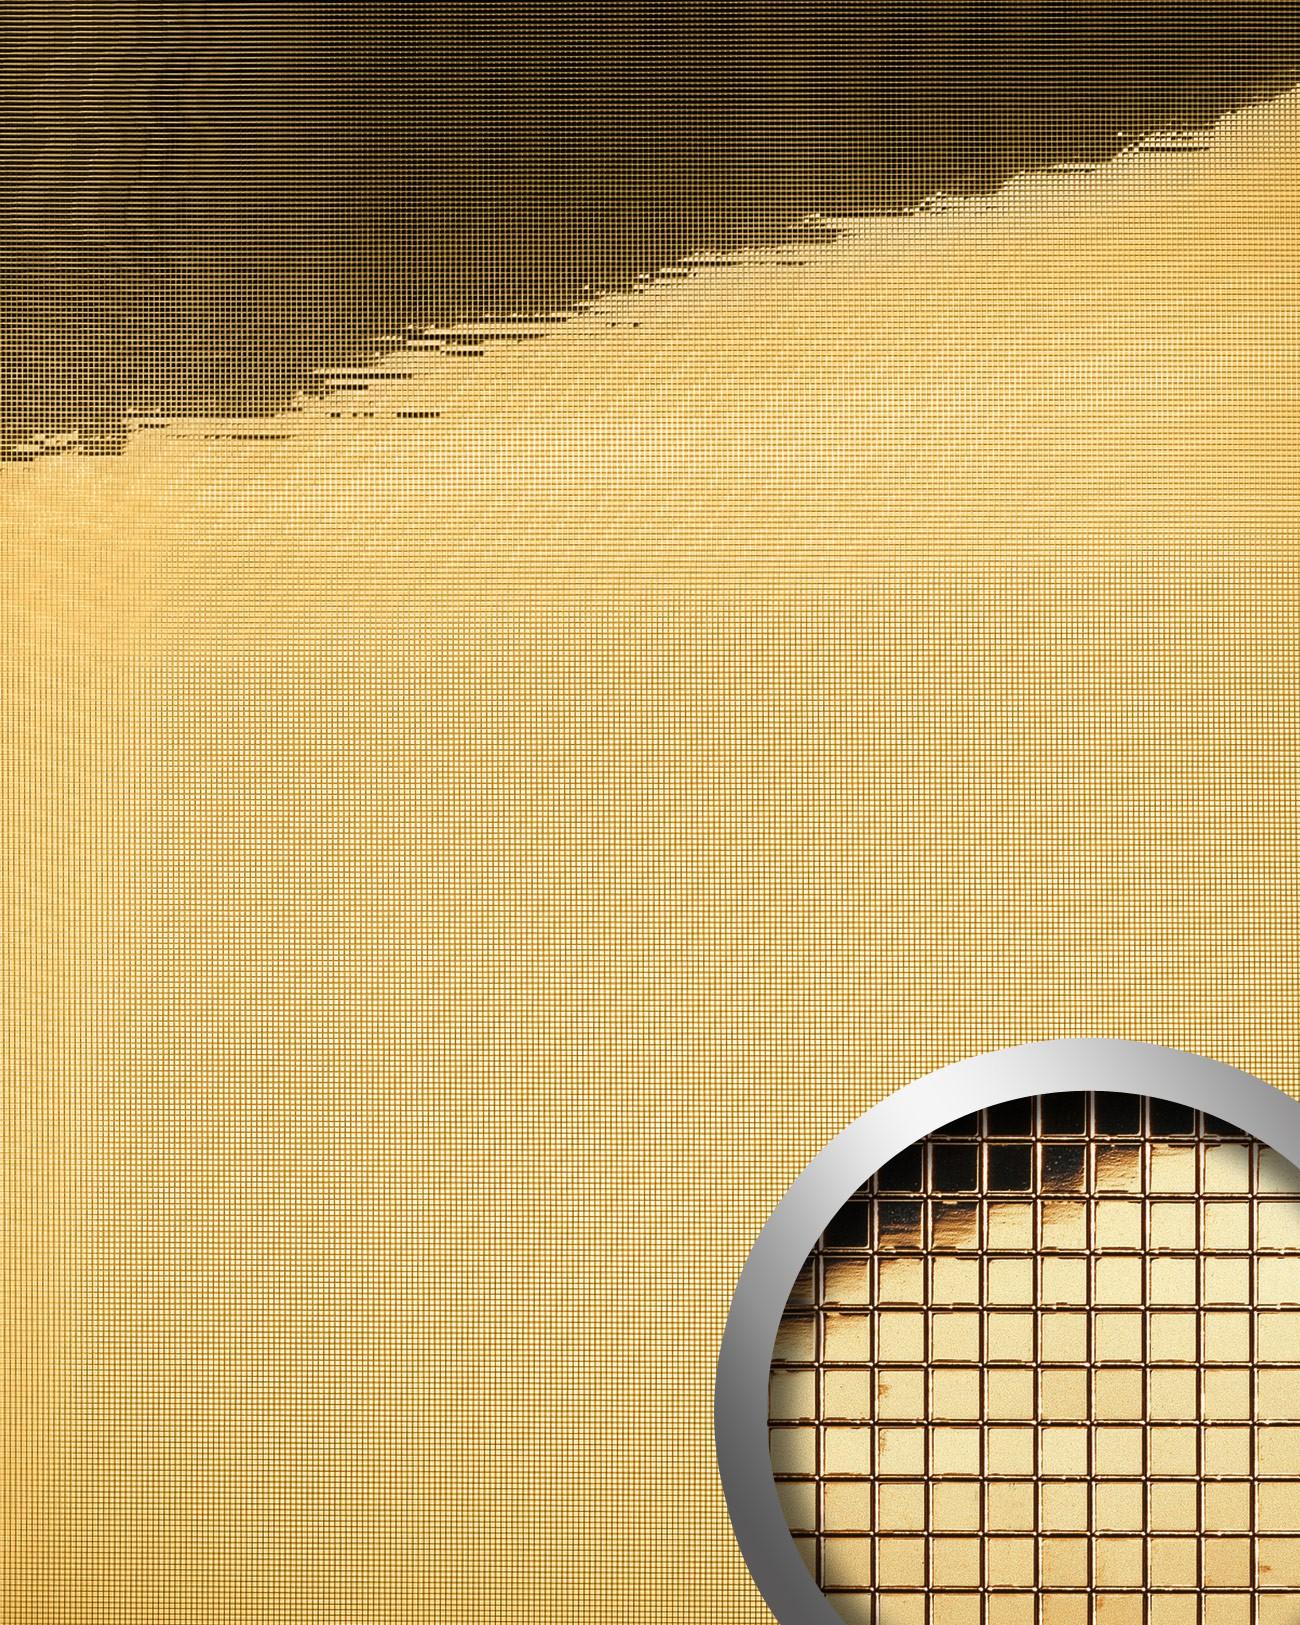 Wandpaneel Wandverkleidung WallFace 10592 M Style Design Platte EyeCatch  Metall Spiegel Mosaik Dekor Selbstklebend ...